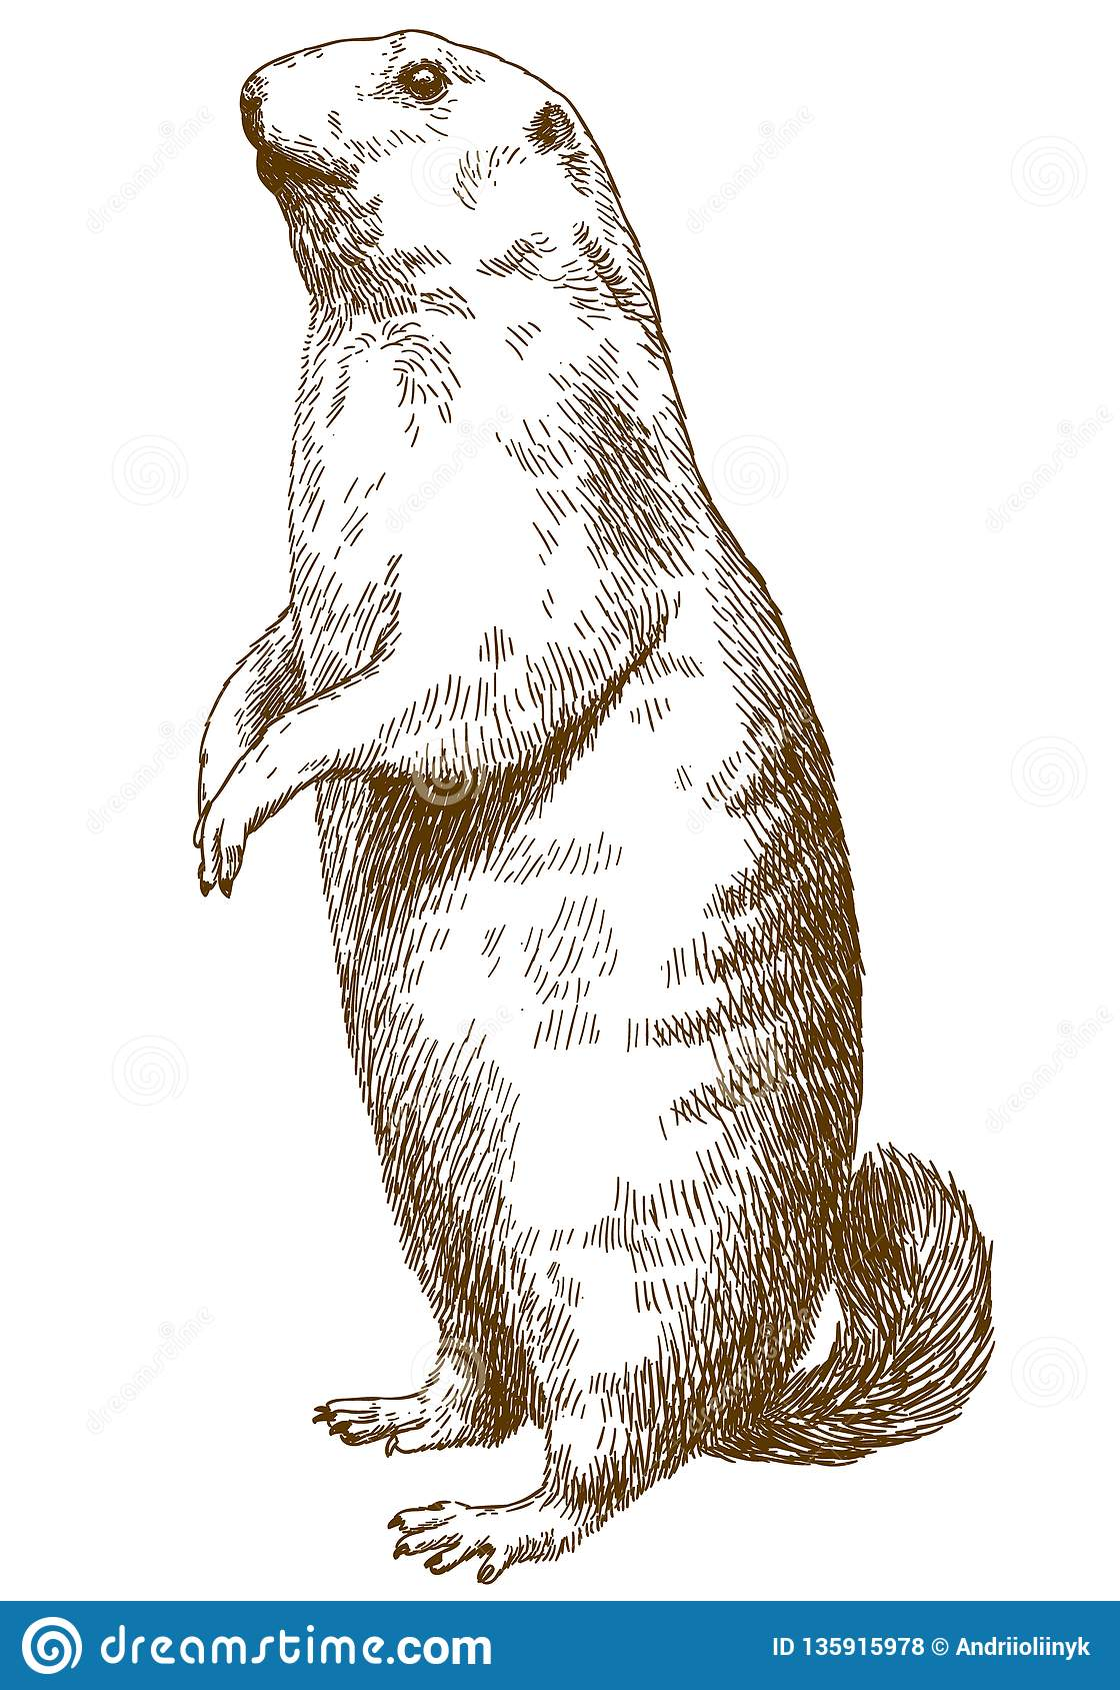 Marmotte Stock Illustrations Vecteurs Clipart 2 110 Stock Illustrations